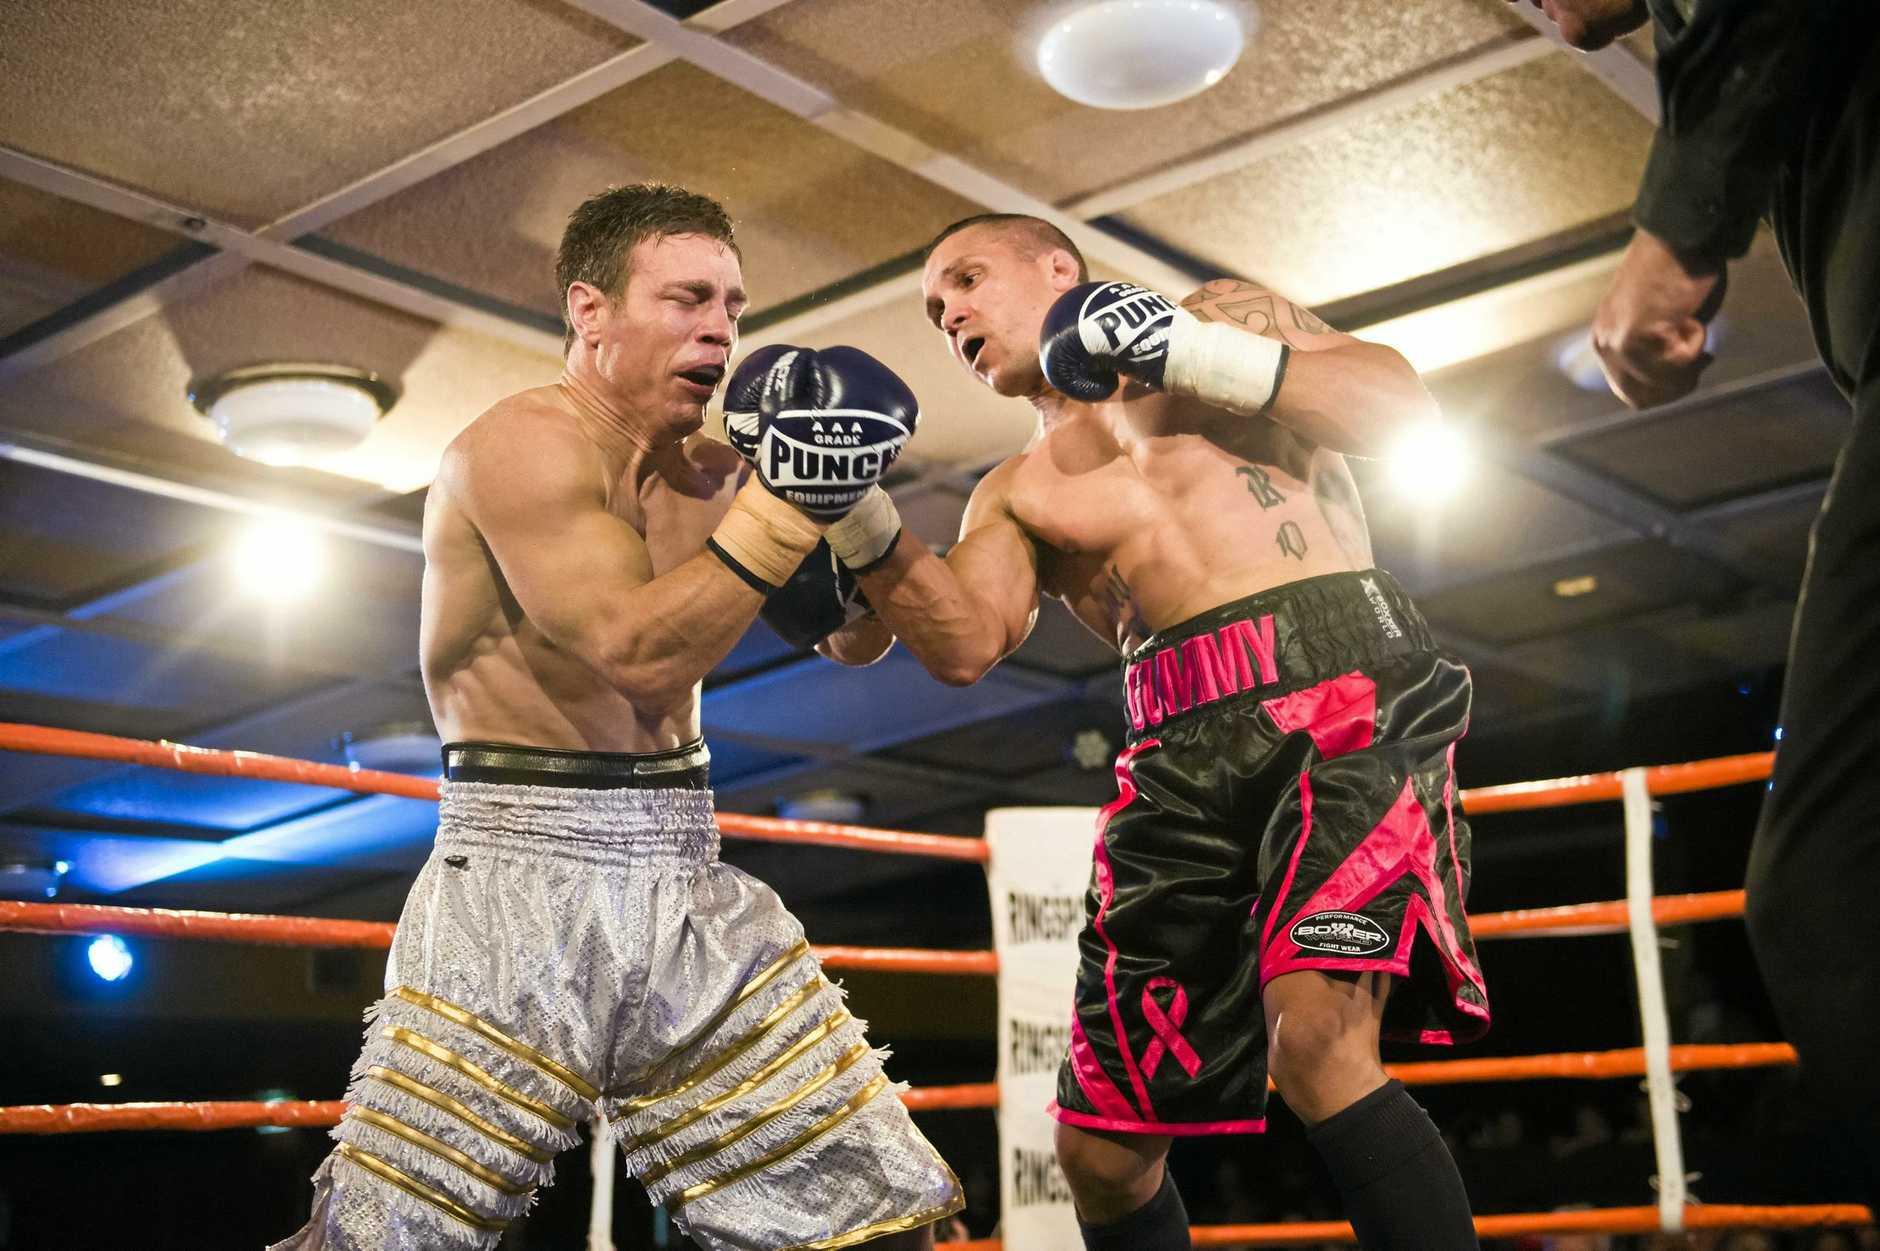 FIGHT NIGHT: Michael Katsidis (left) and Robert Toomey trade blows during their Super8 quarter final. Katsidis went on to win the fight.